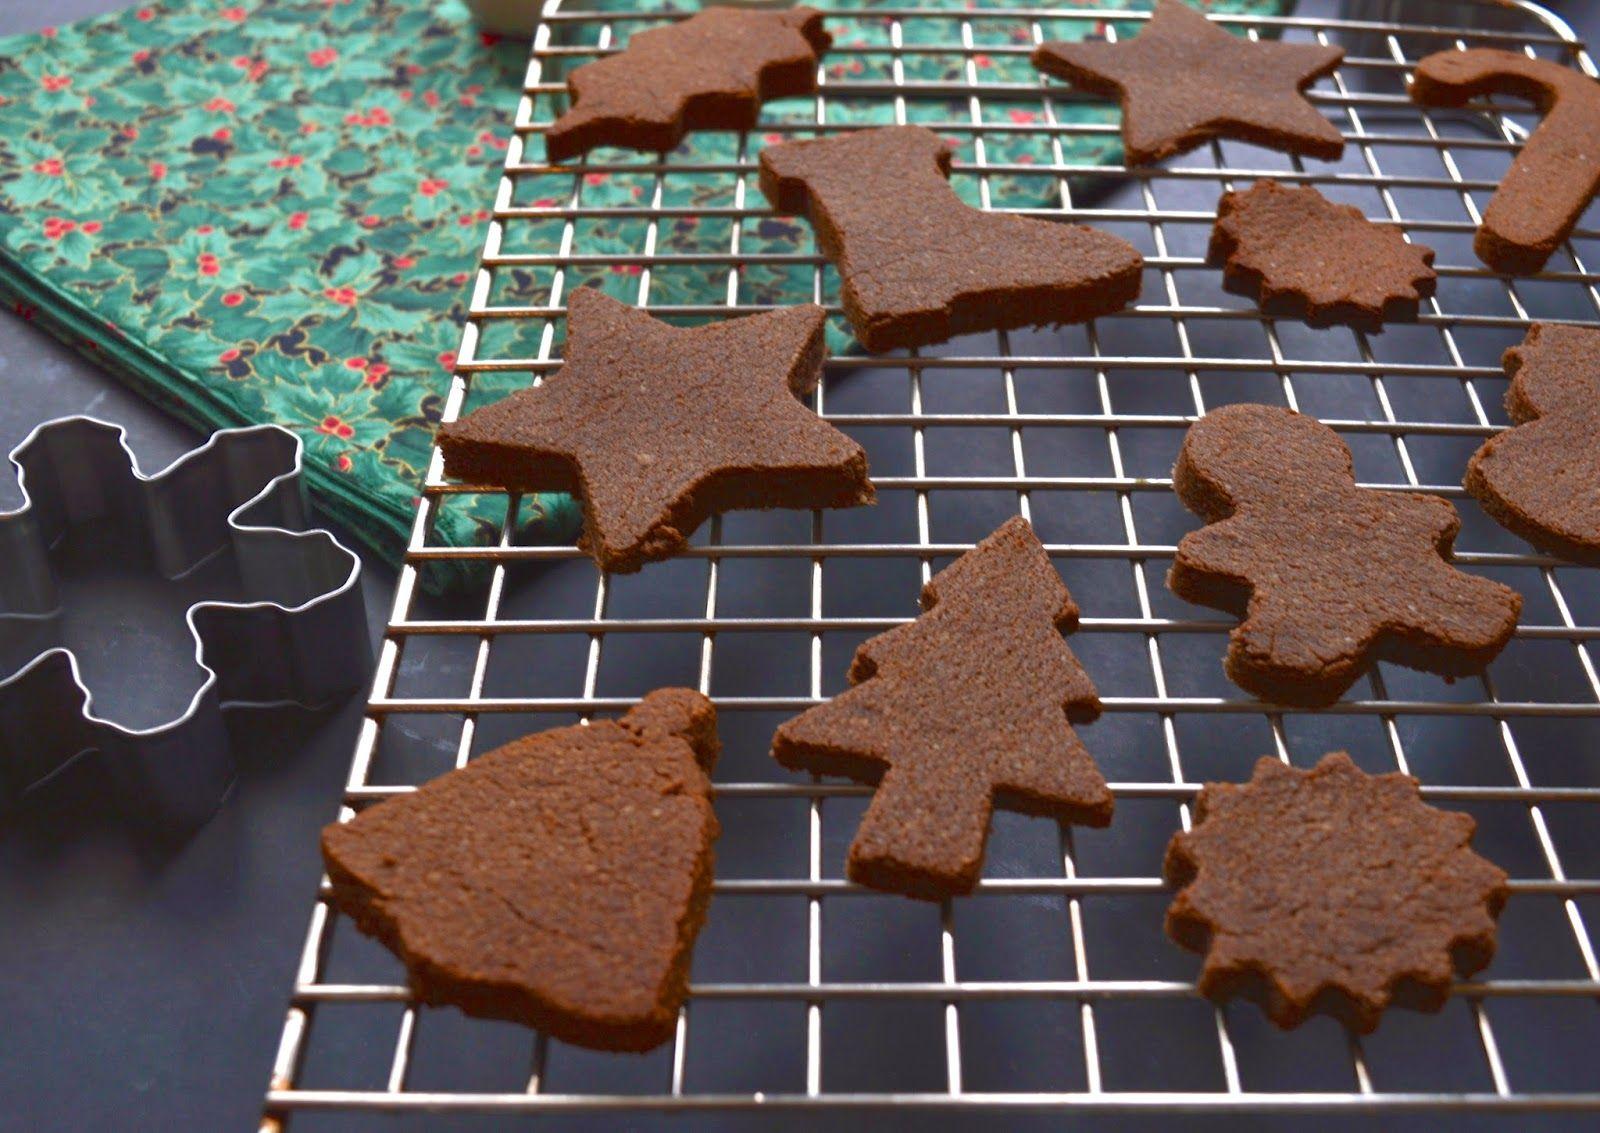 Chocolate Ginger Cookies (Paleo, GAPS, Gluten Free, Egg Free)